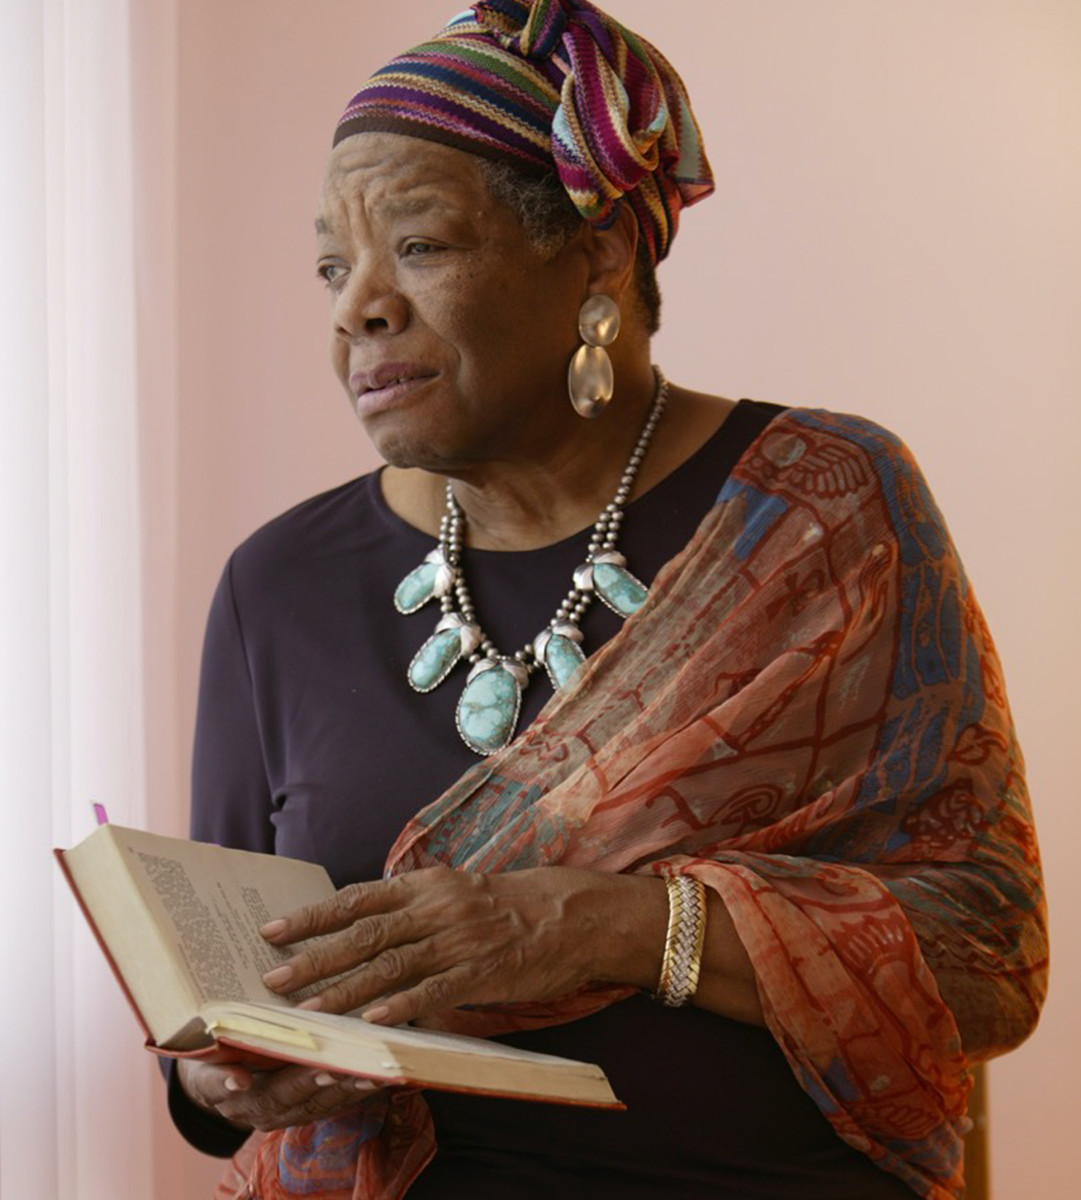 Maya Angelou's